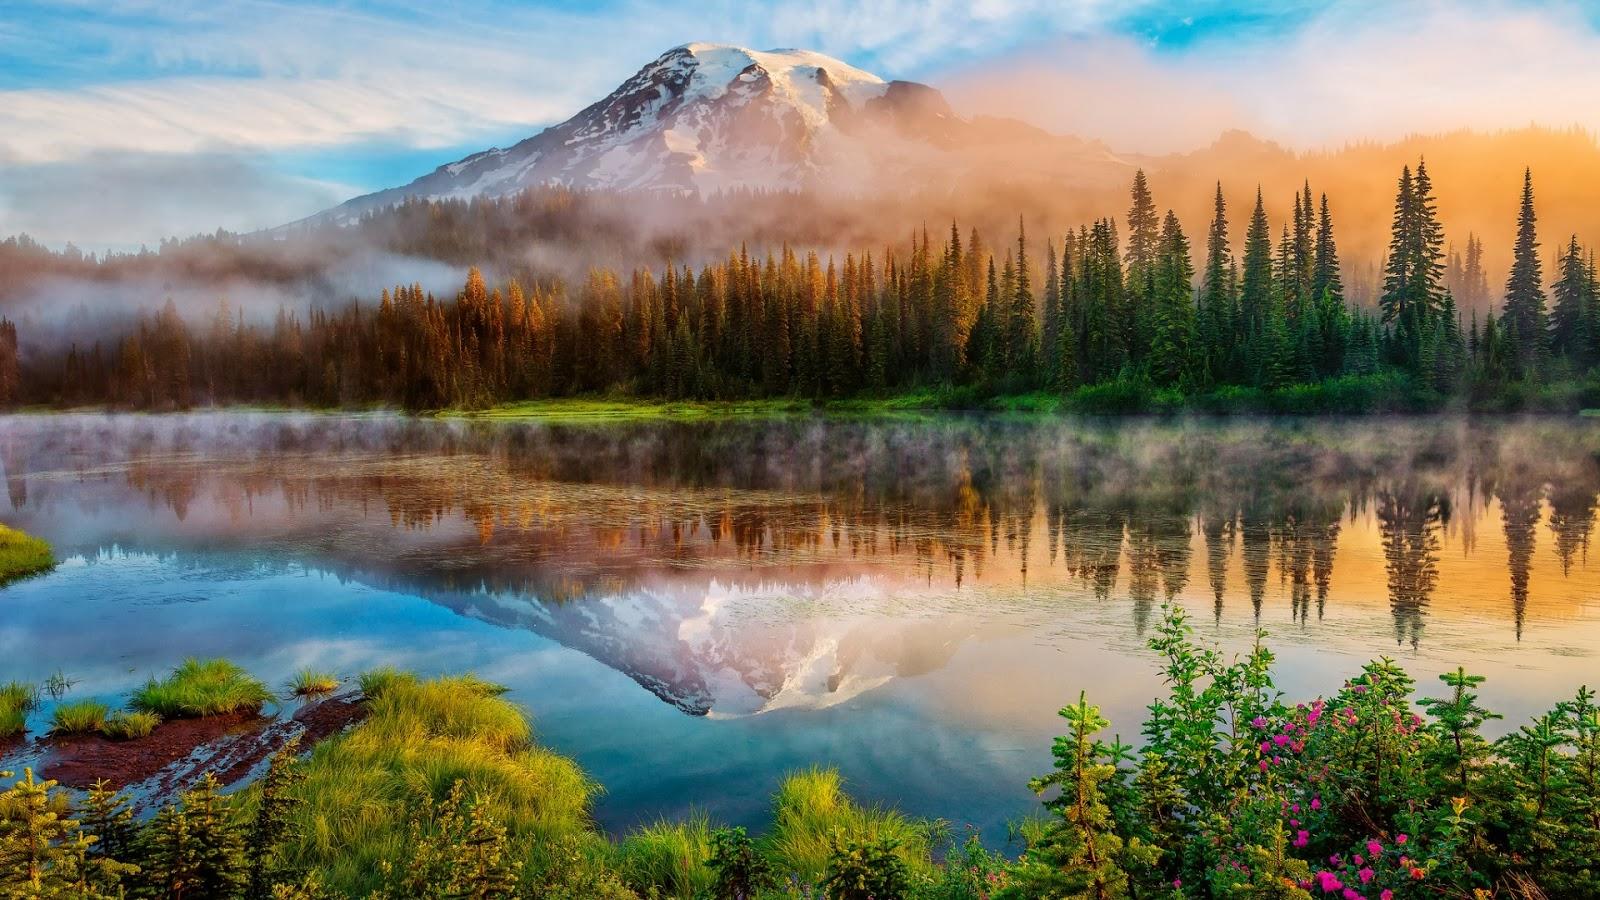 Beautiful Places on Earth Mount Rainier Landscape Wallpaper 1600x900